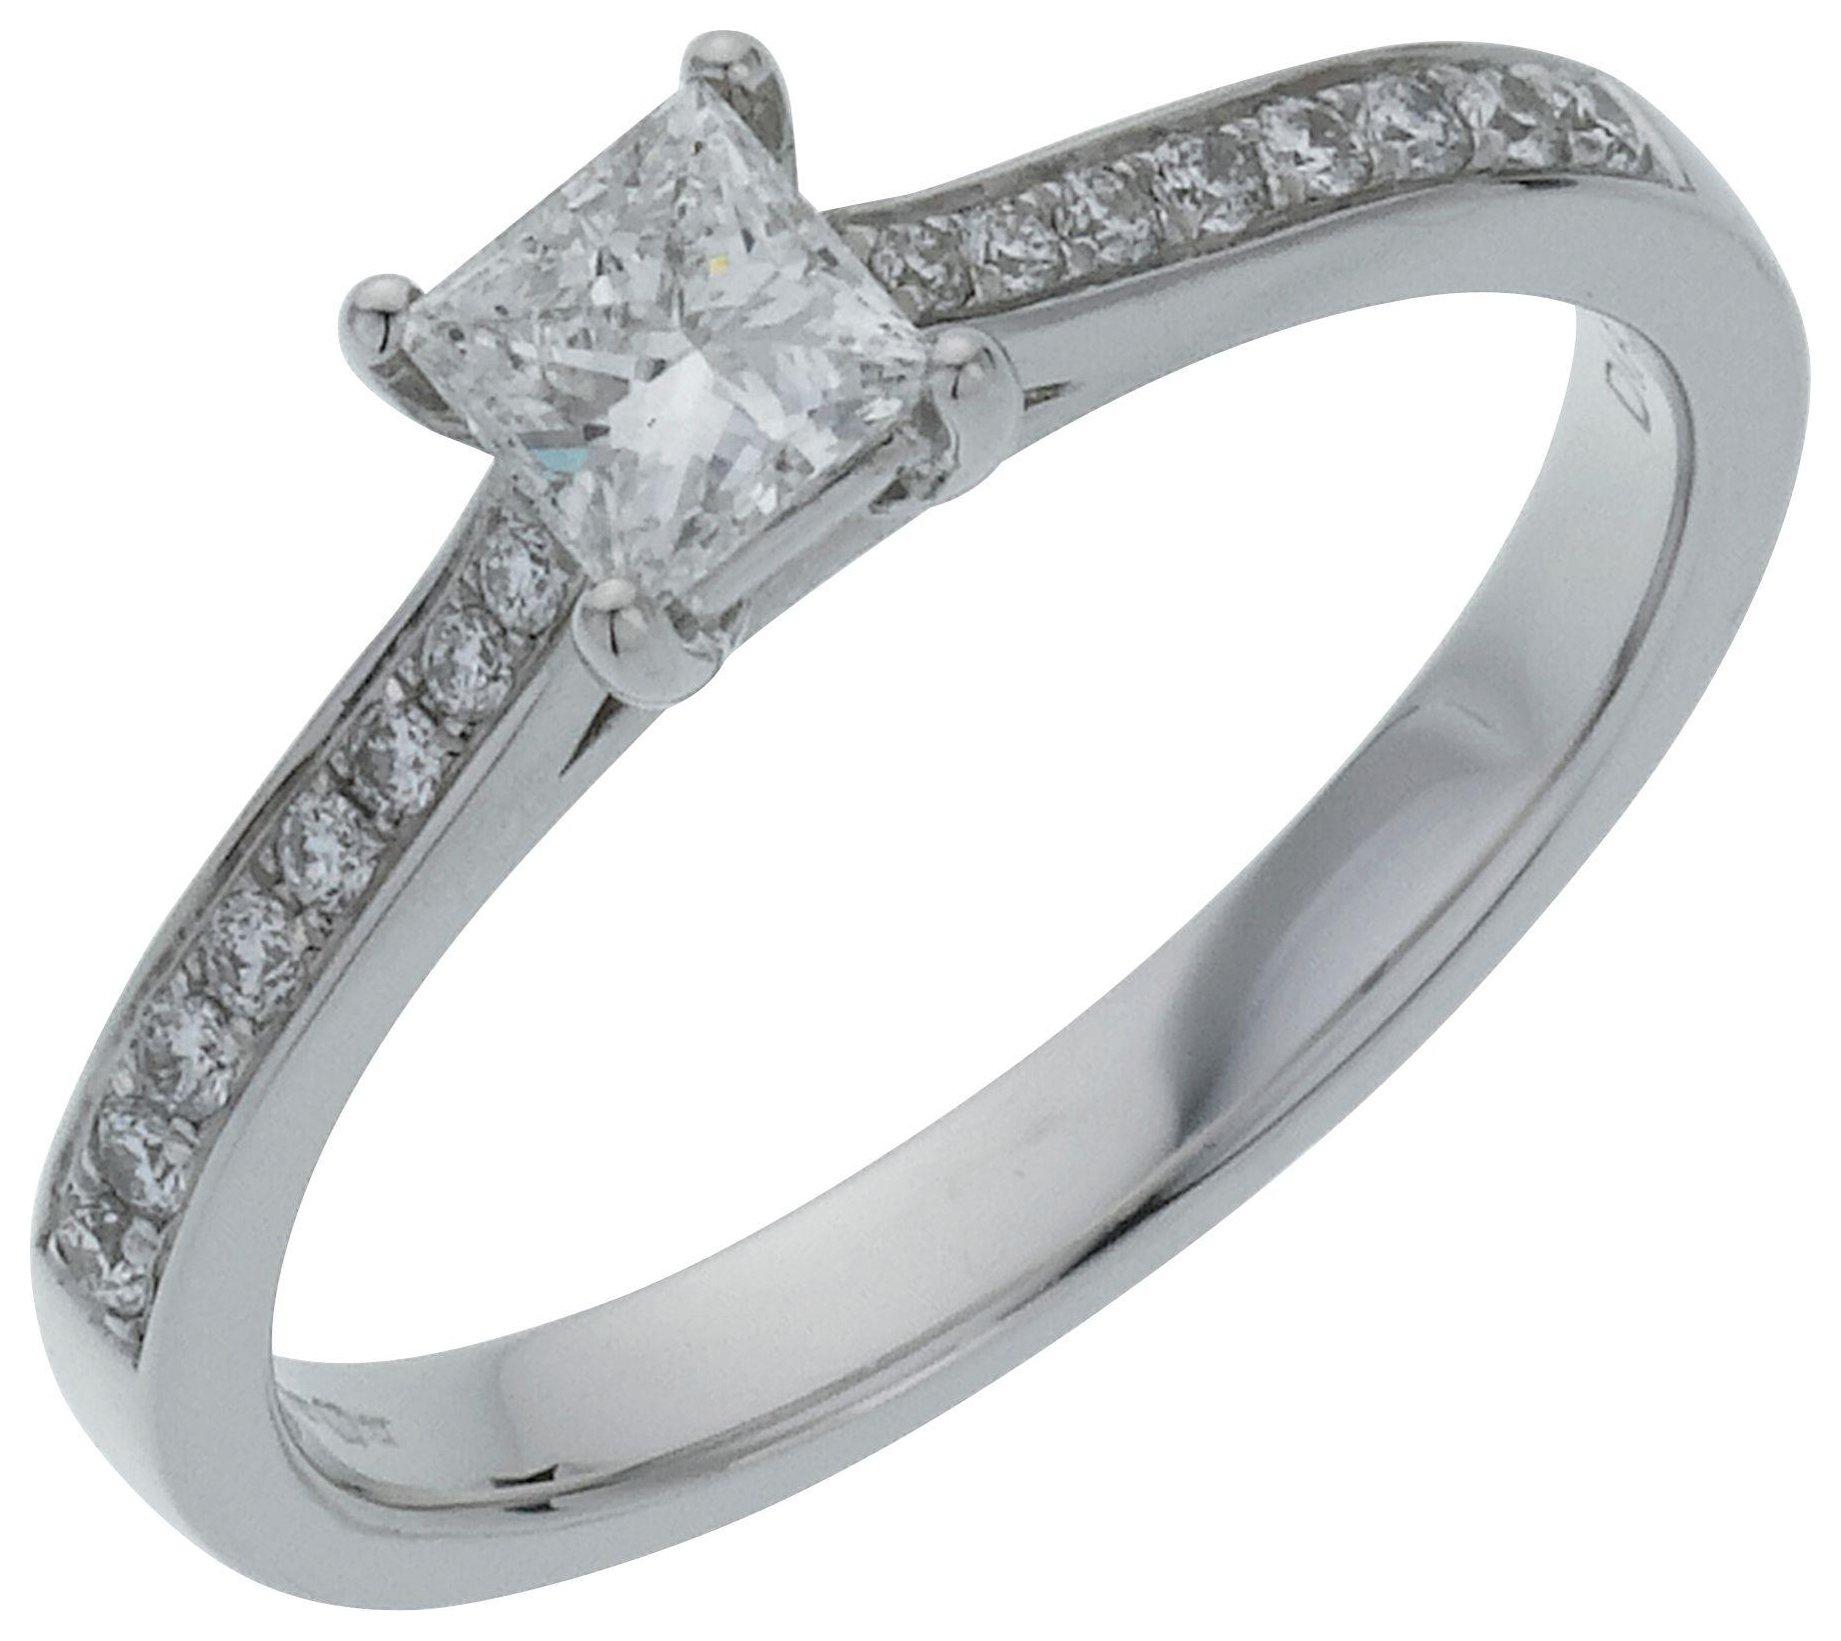 18 Carat White Gold 05 Carat Diamond - Princess Cut Shoulder Ring- Q